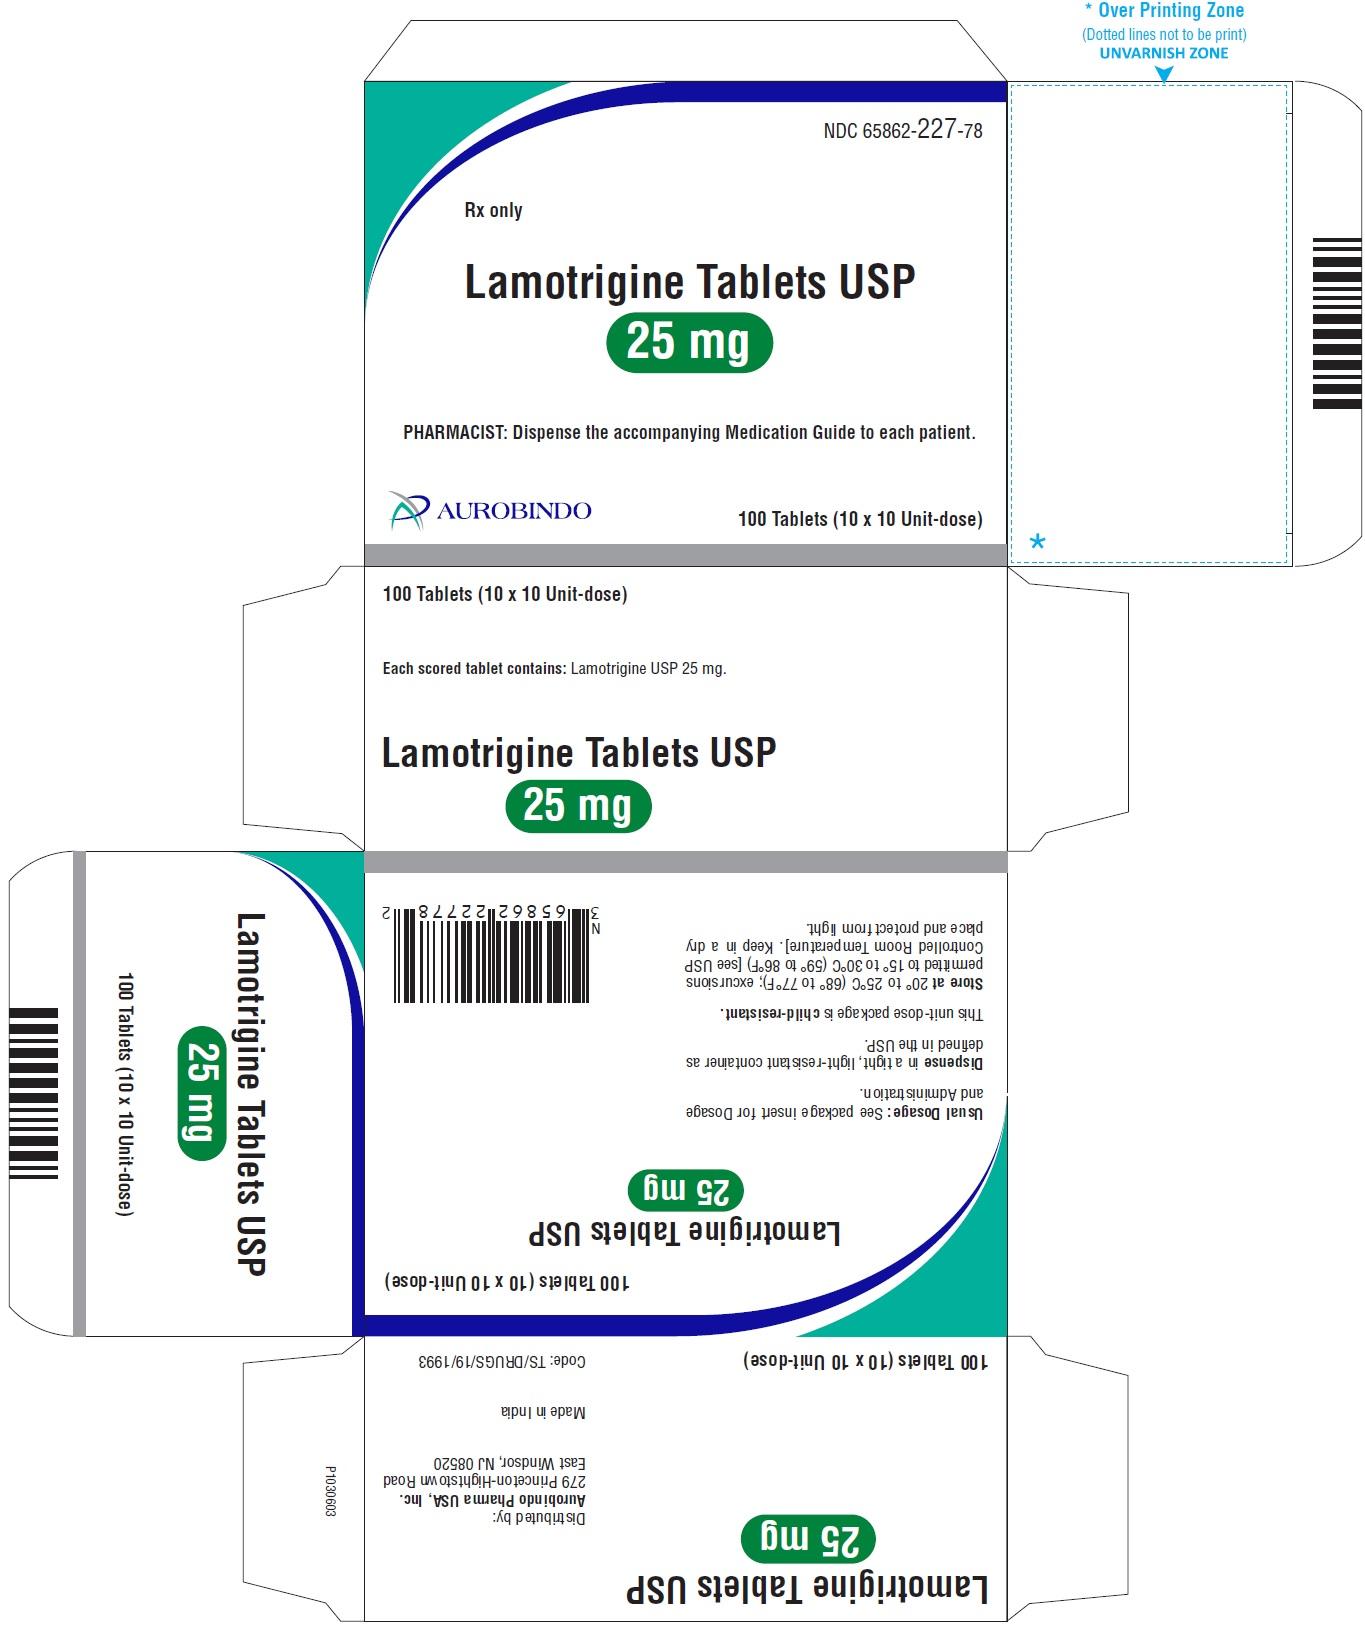 PACKAGE LABEL-PRINCIPAL DISPLAY PANEL - 25 mg Blister Carton (10 x 10 Unit-dose)